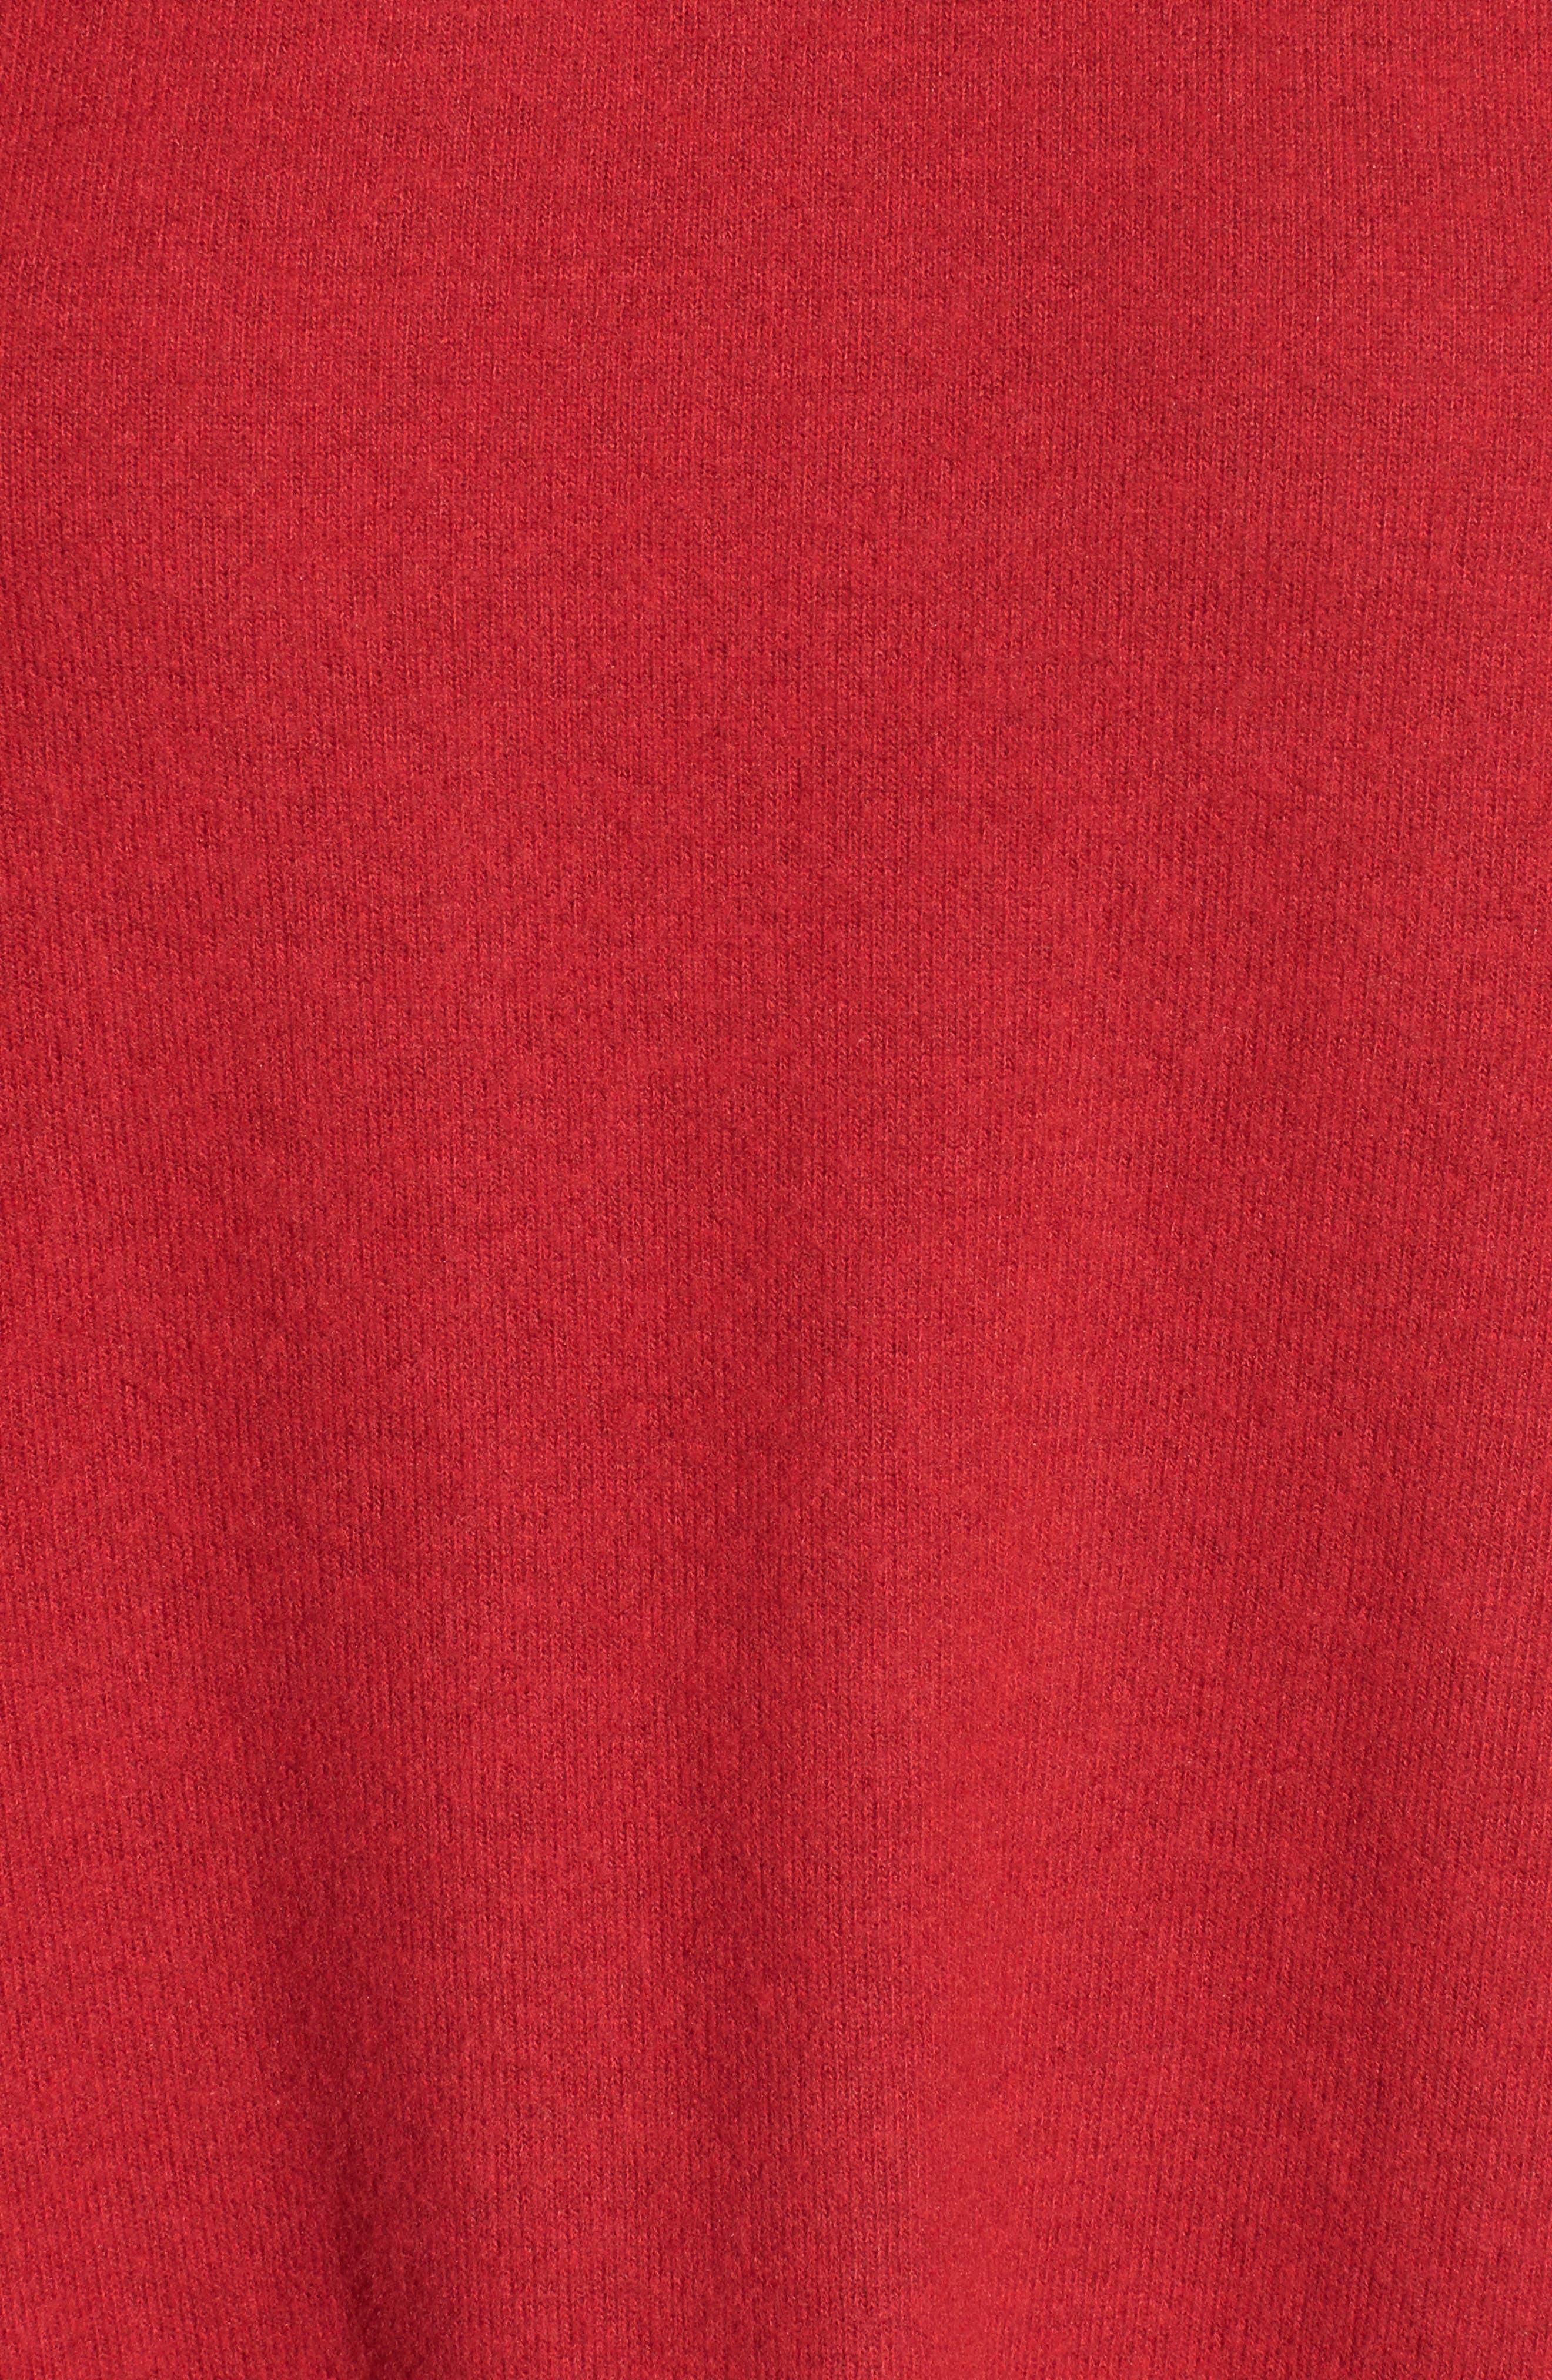 Alternate Image 5  - Gibson Cozy Fleece Ballet Neck High/Low Pullover (Regular & Petite)